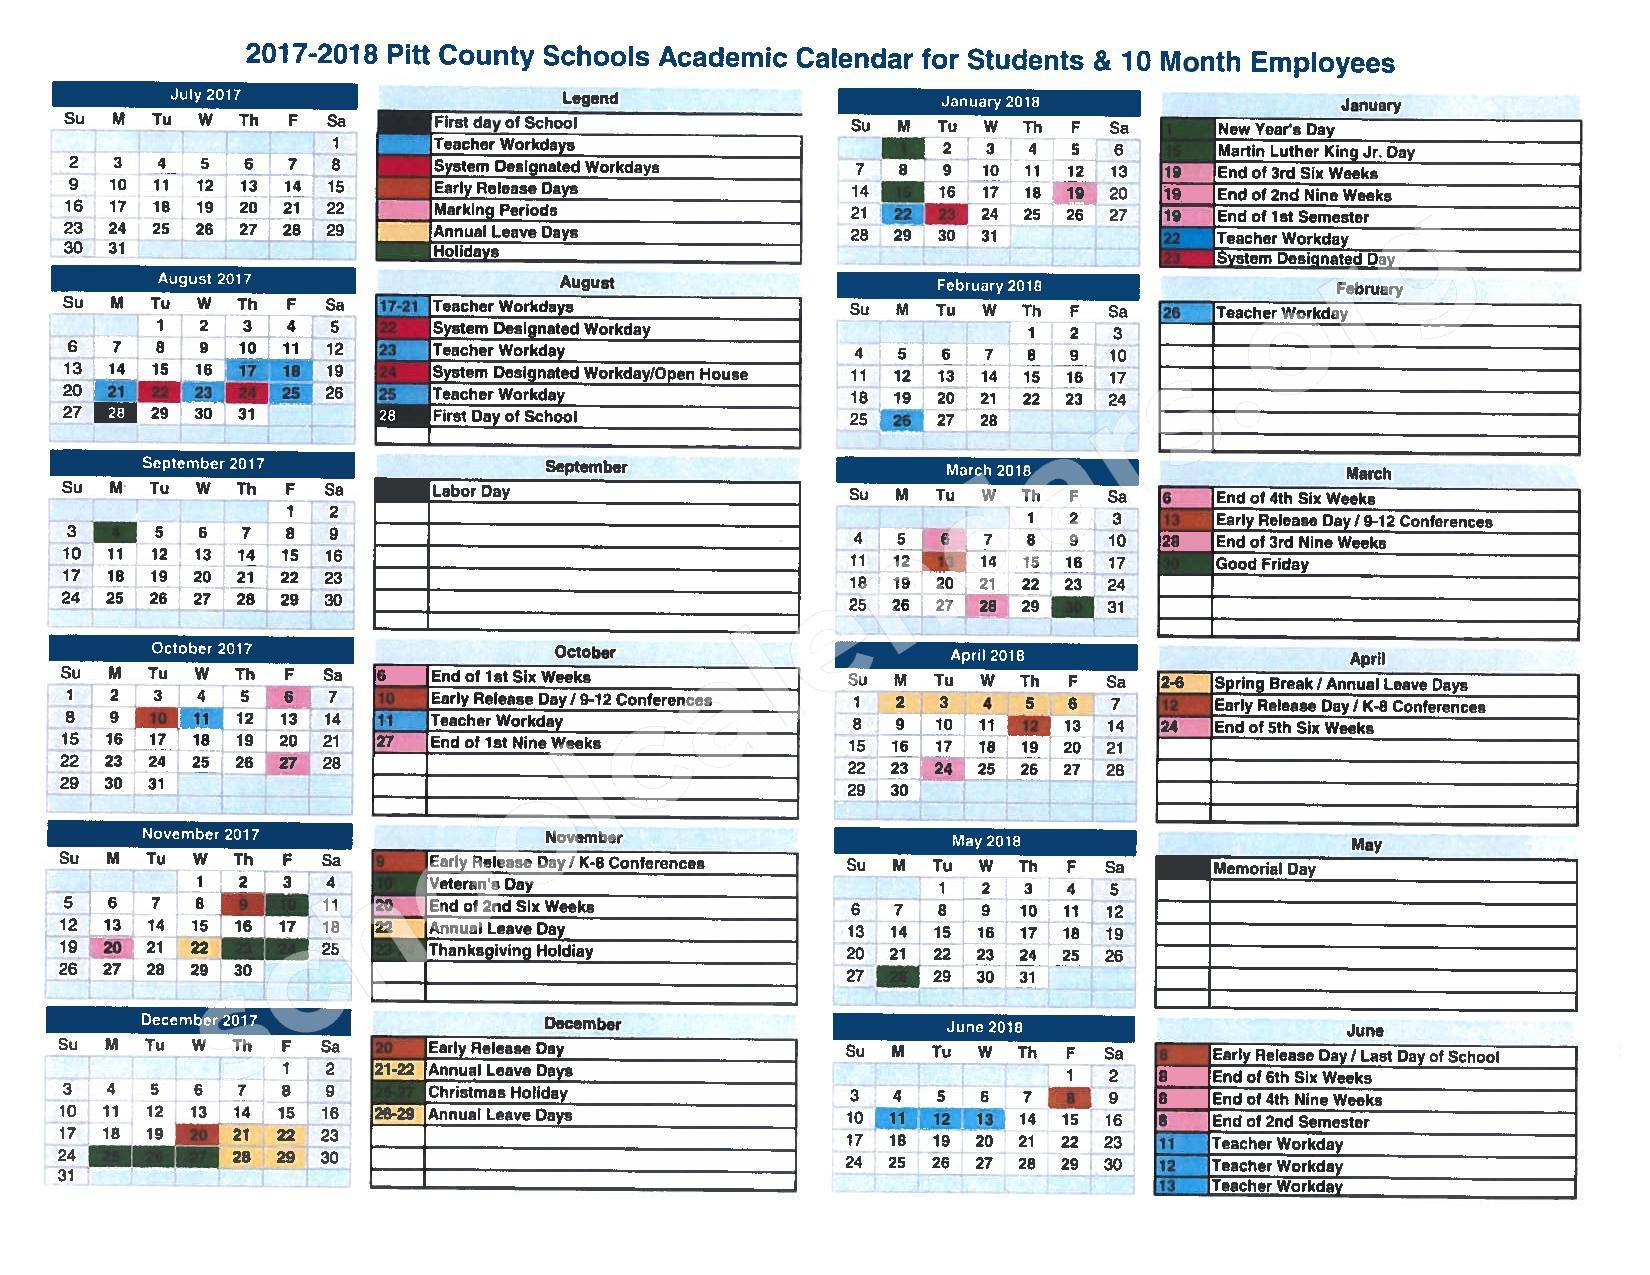 Pitt Academic Calendar 2018 16 Aigb